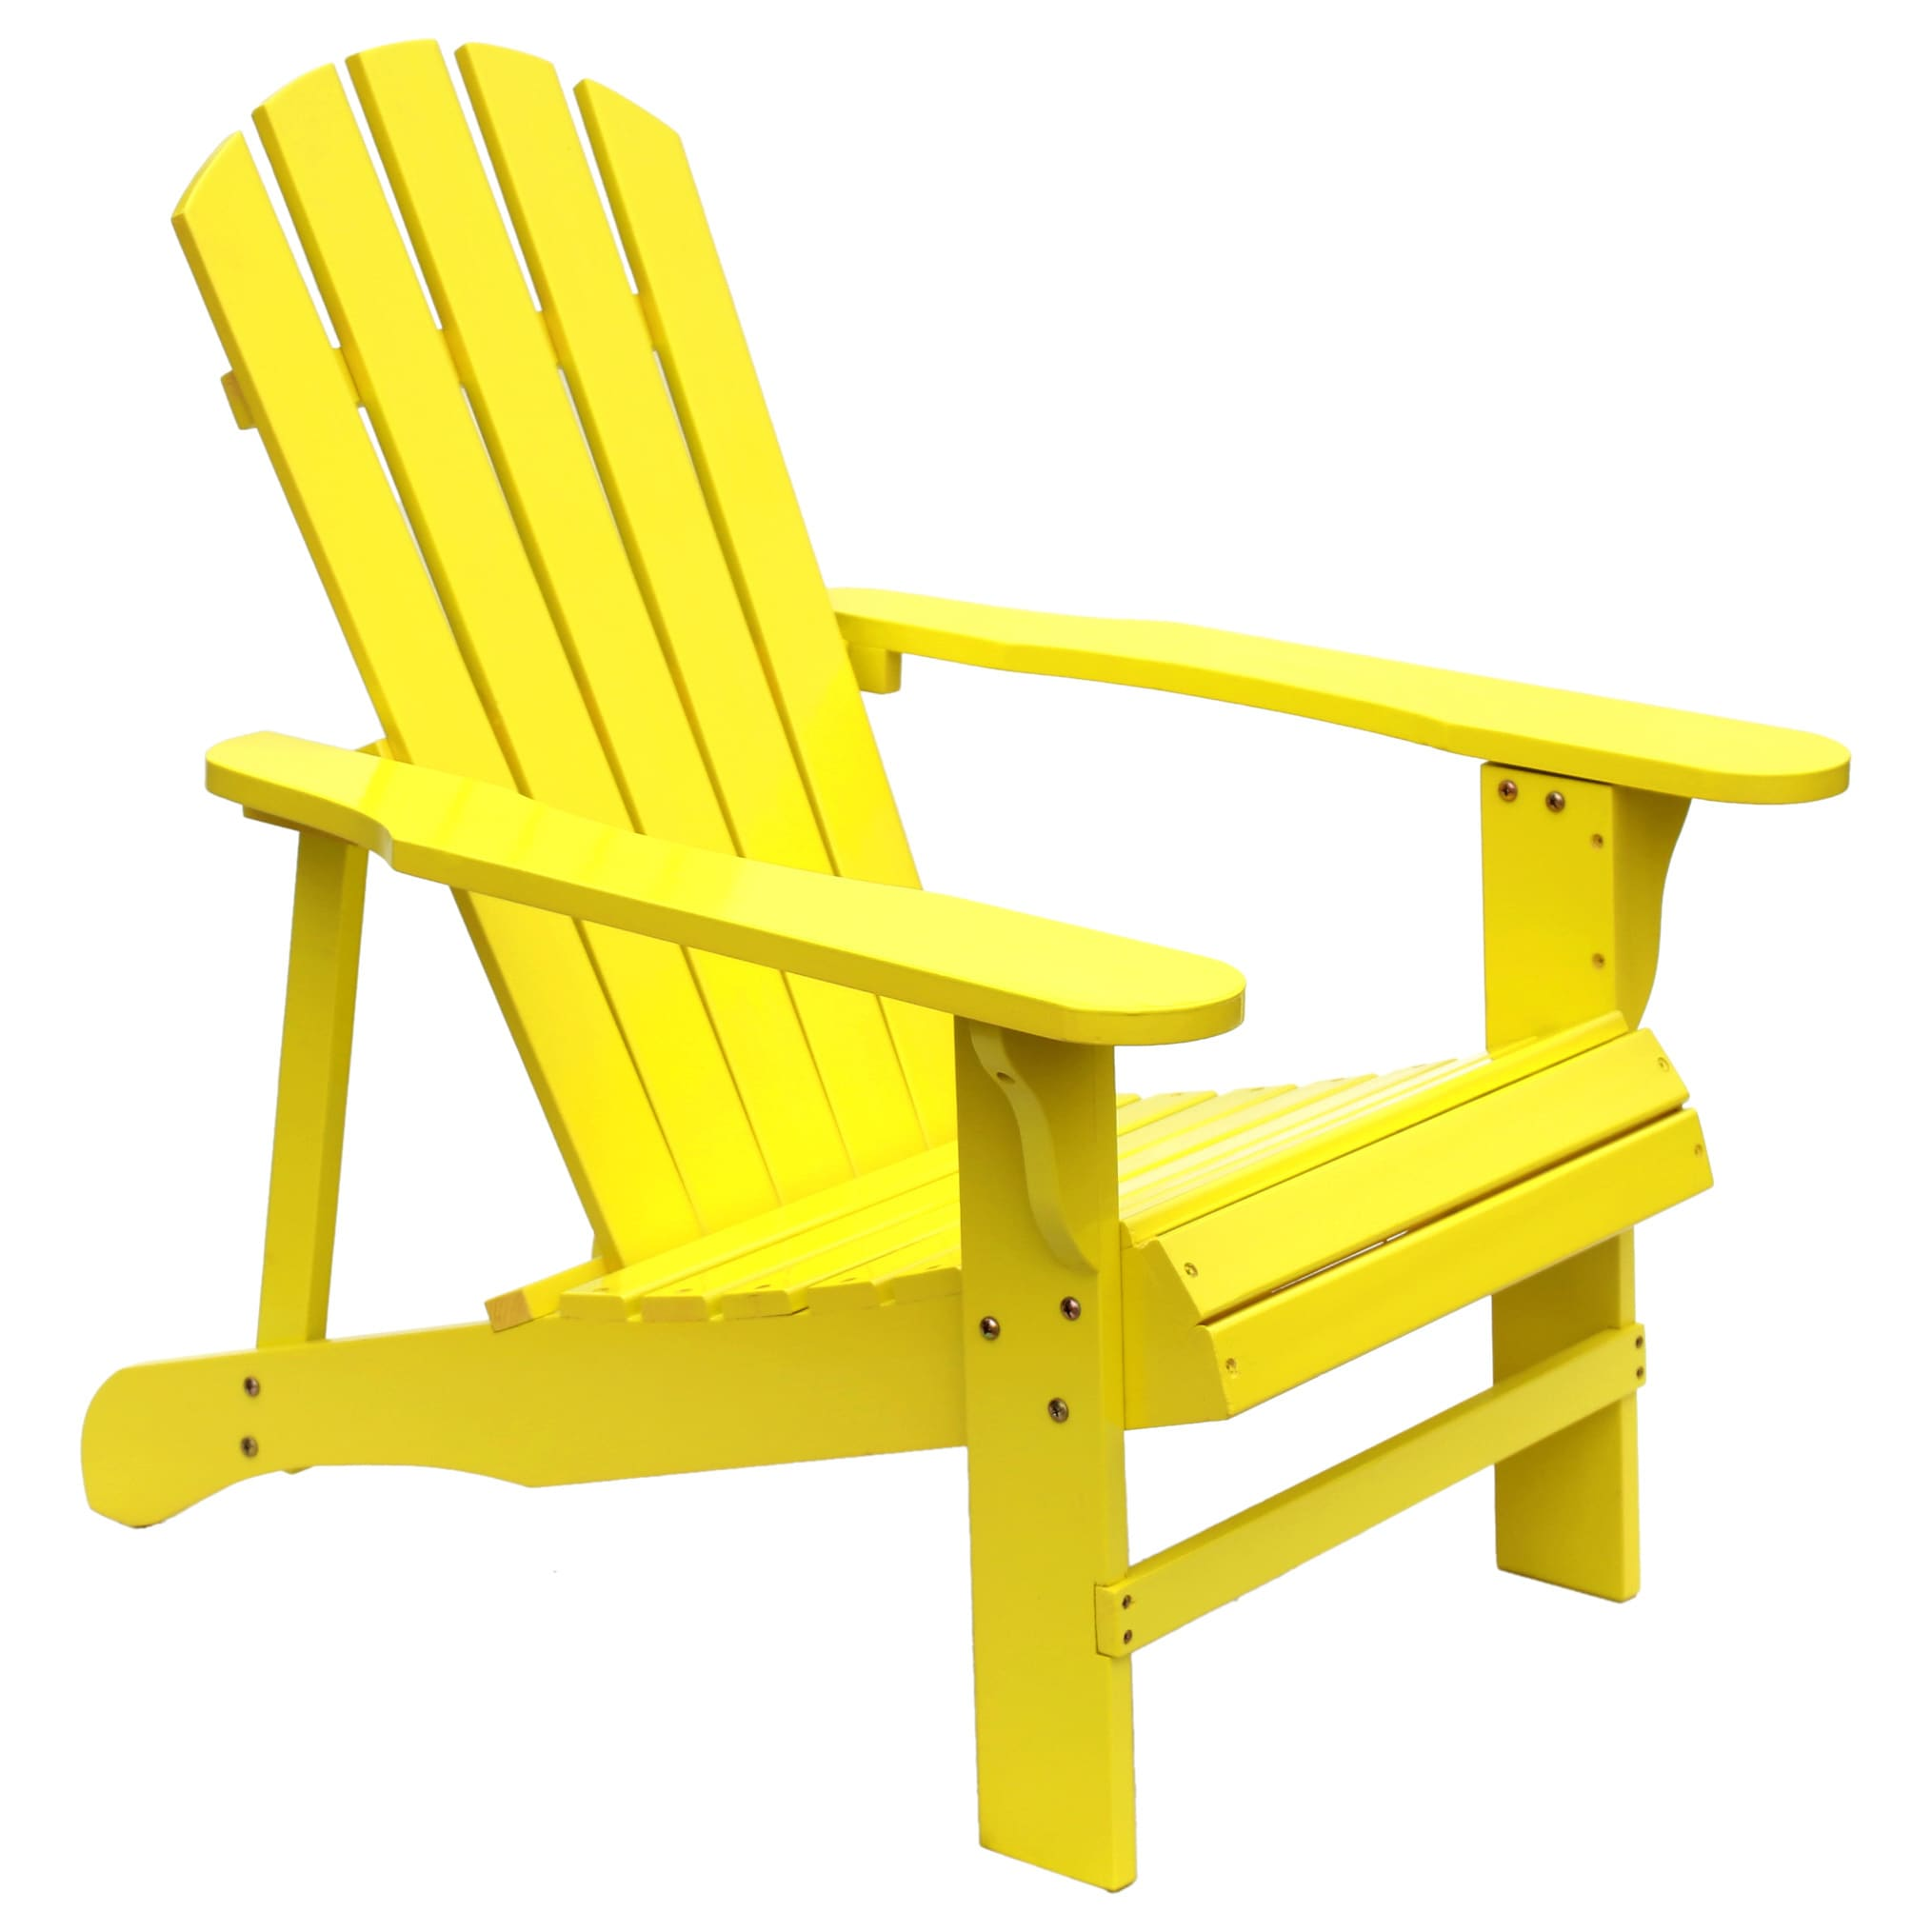 Adirondack Chairs Deals On 1001 Blocks